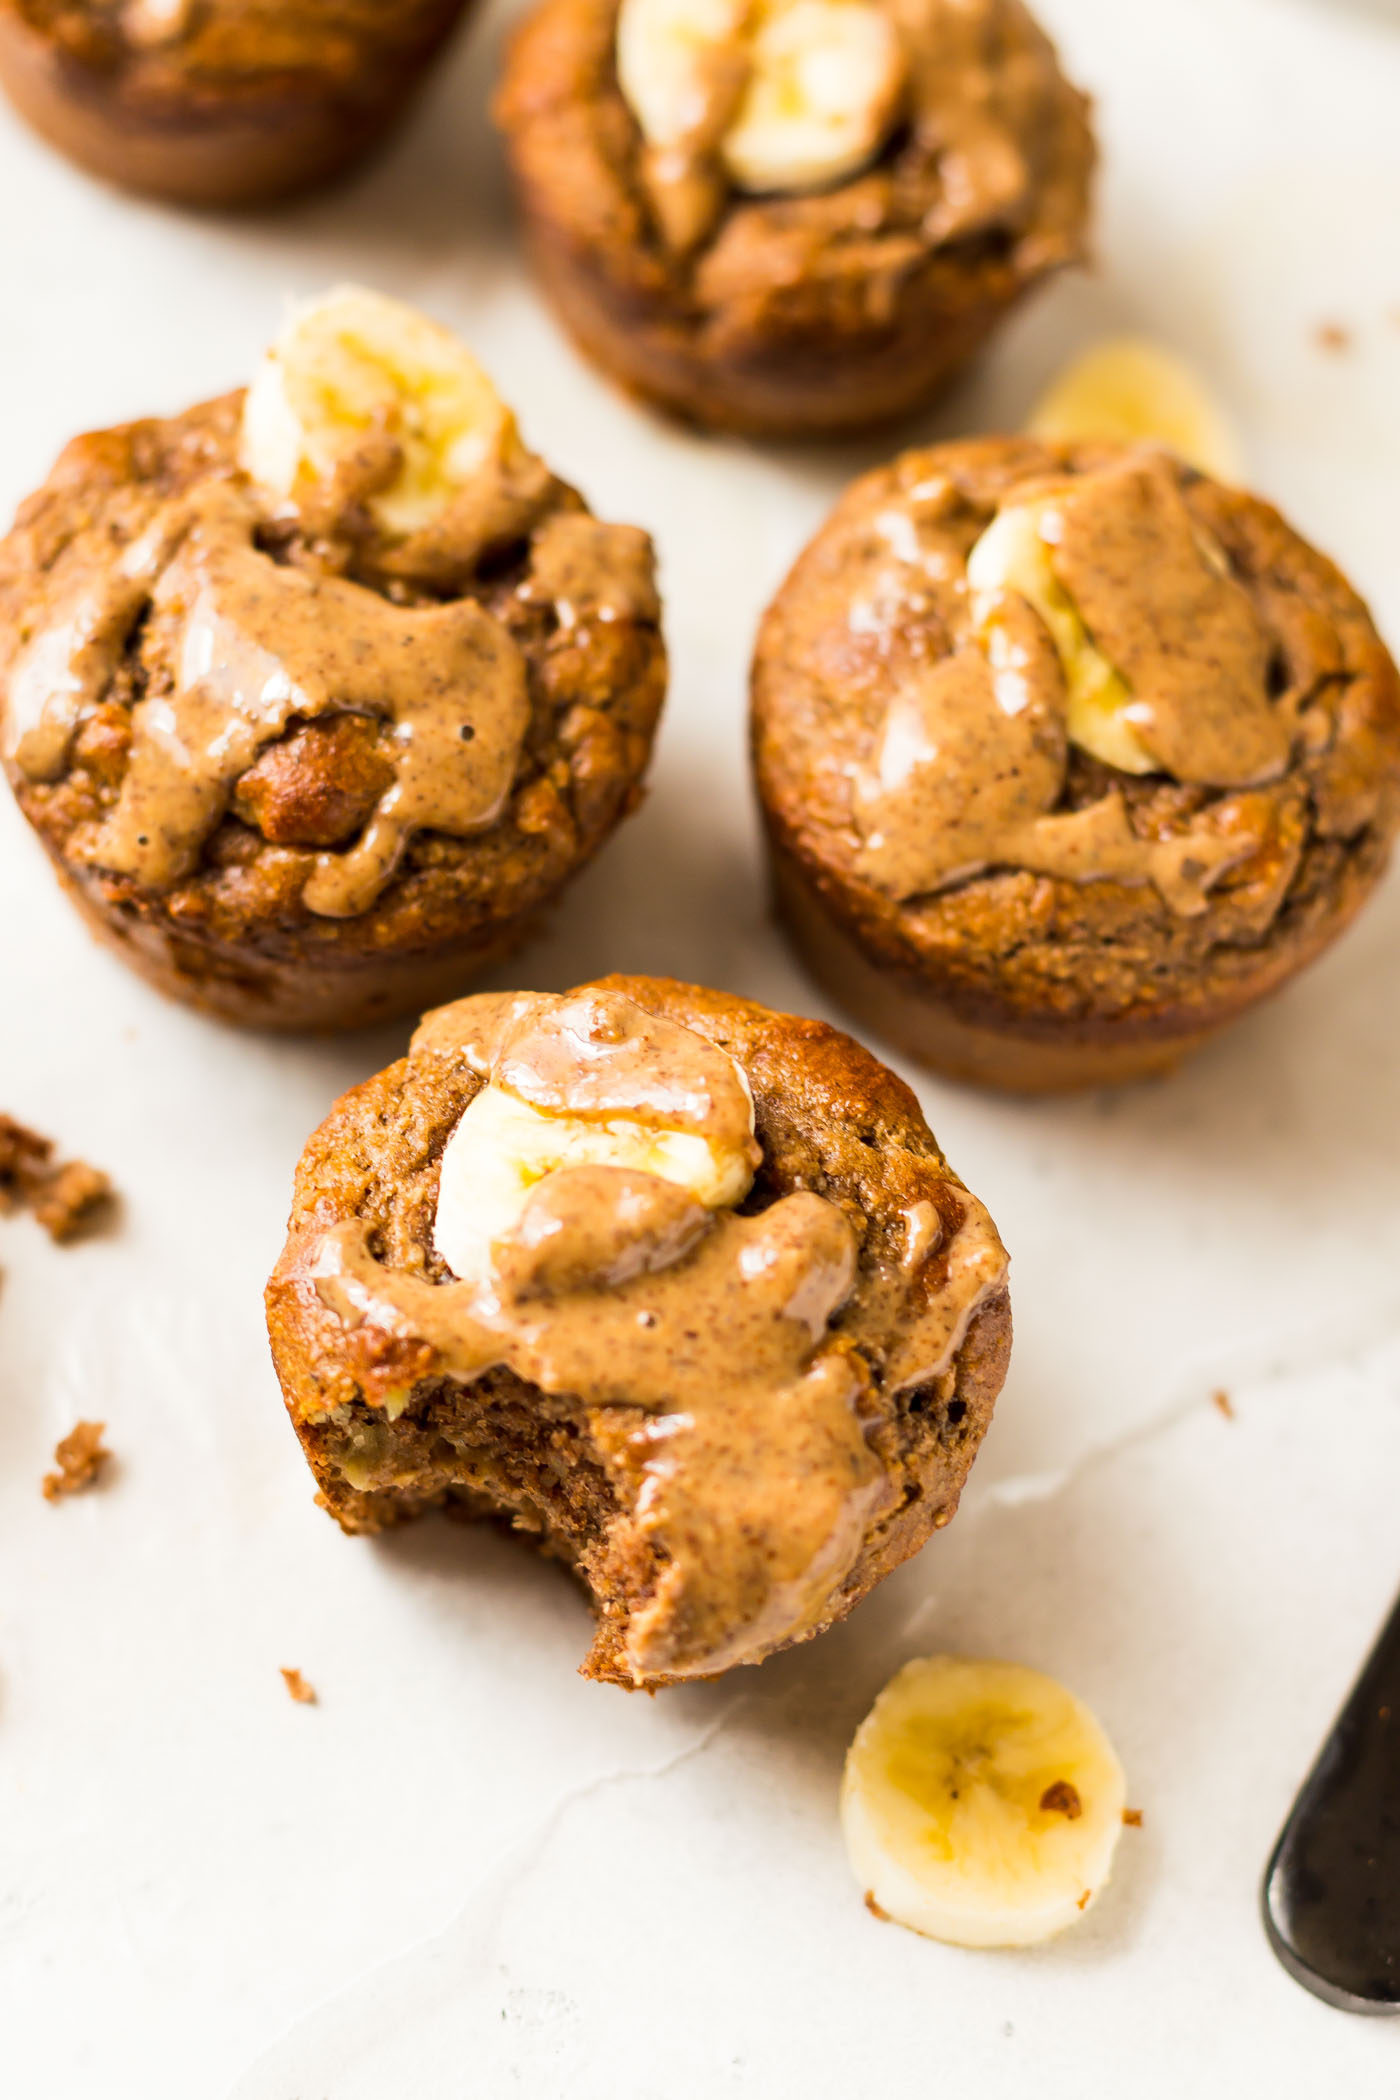 Banana Protein Powder Muffins